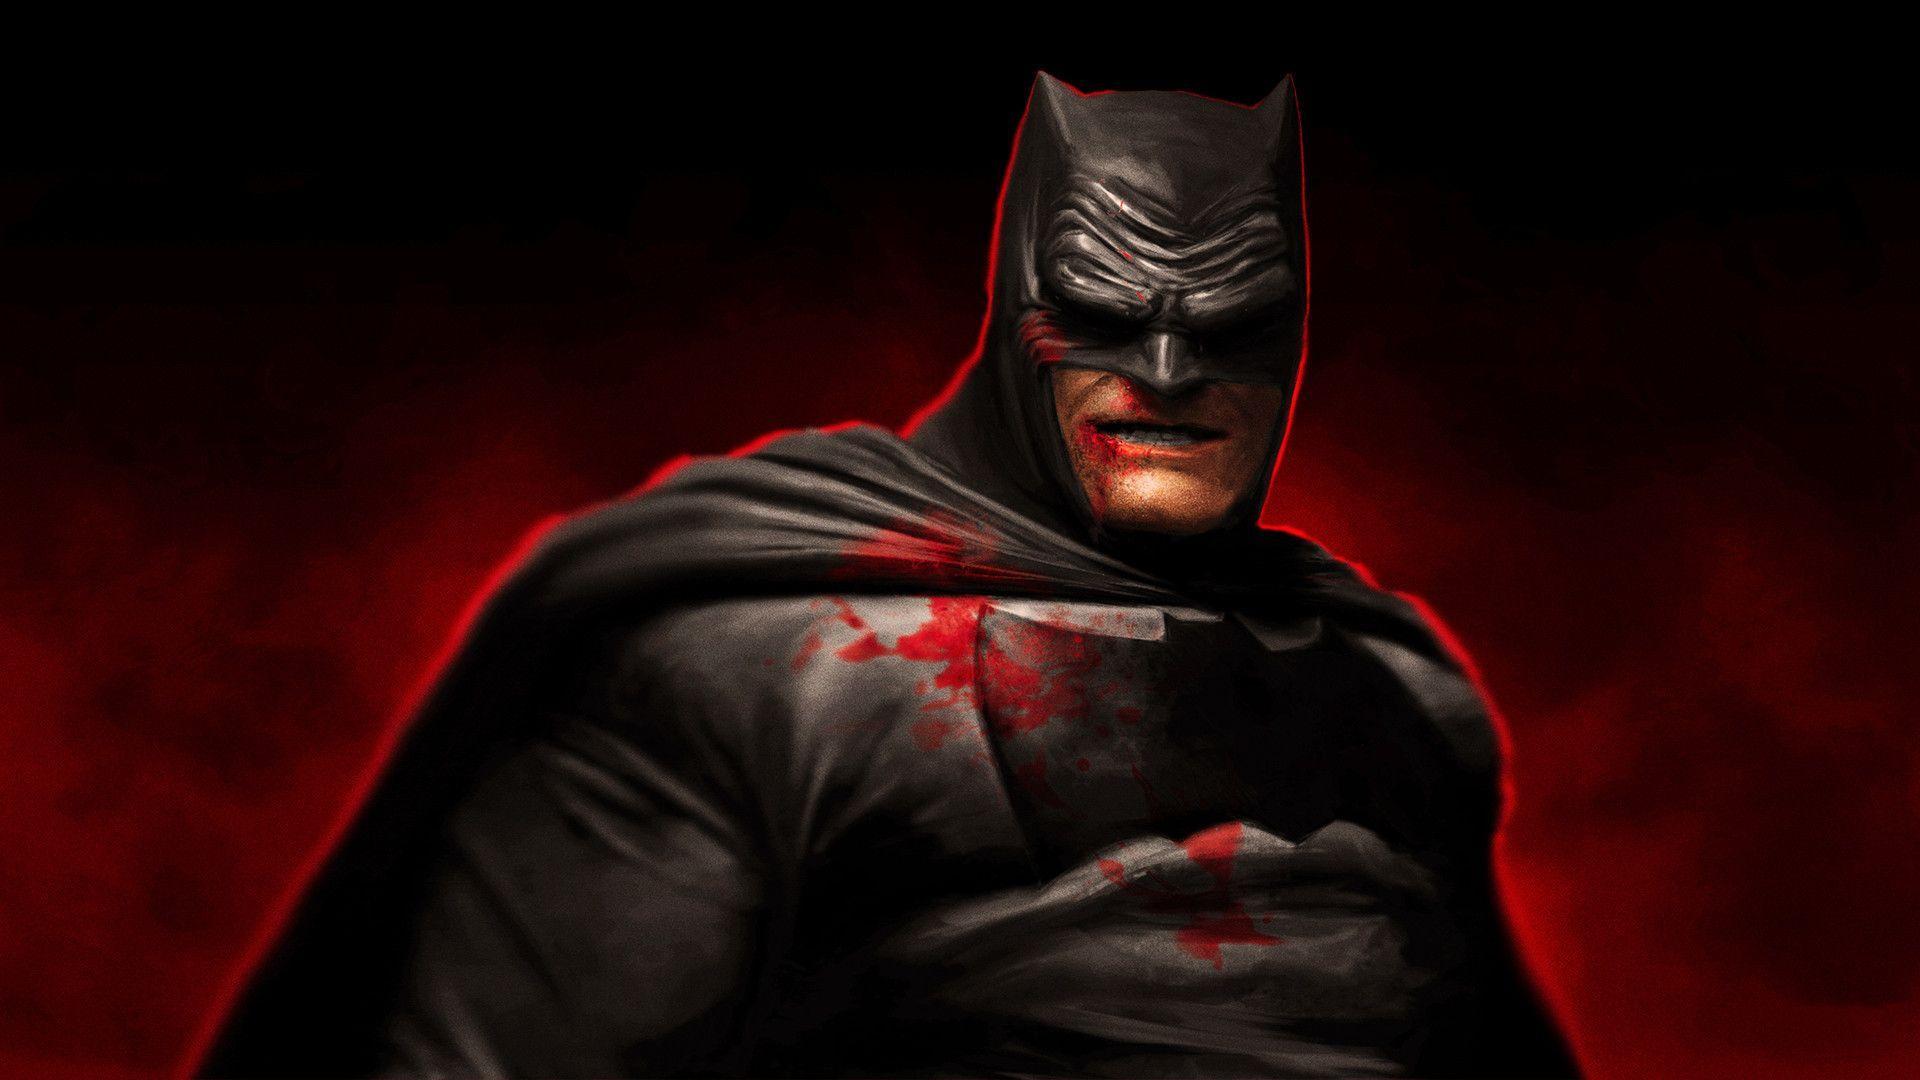 batman knight dark returns wallpapers return deviantart comics fu breds desktop wallpapercave background backgrounds millions upto multimedia database designers artists